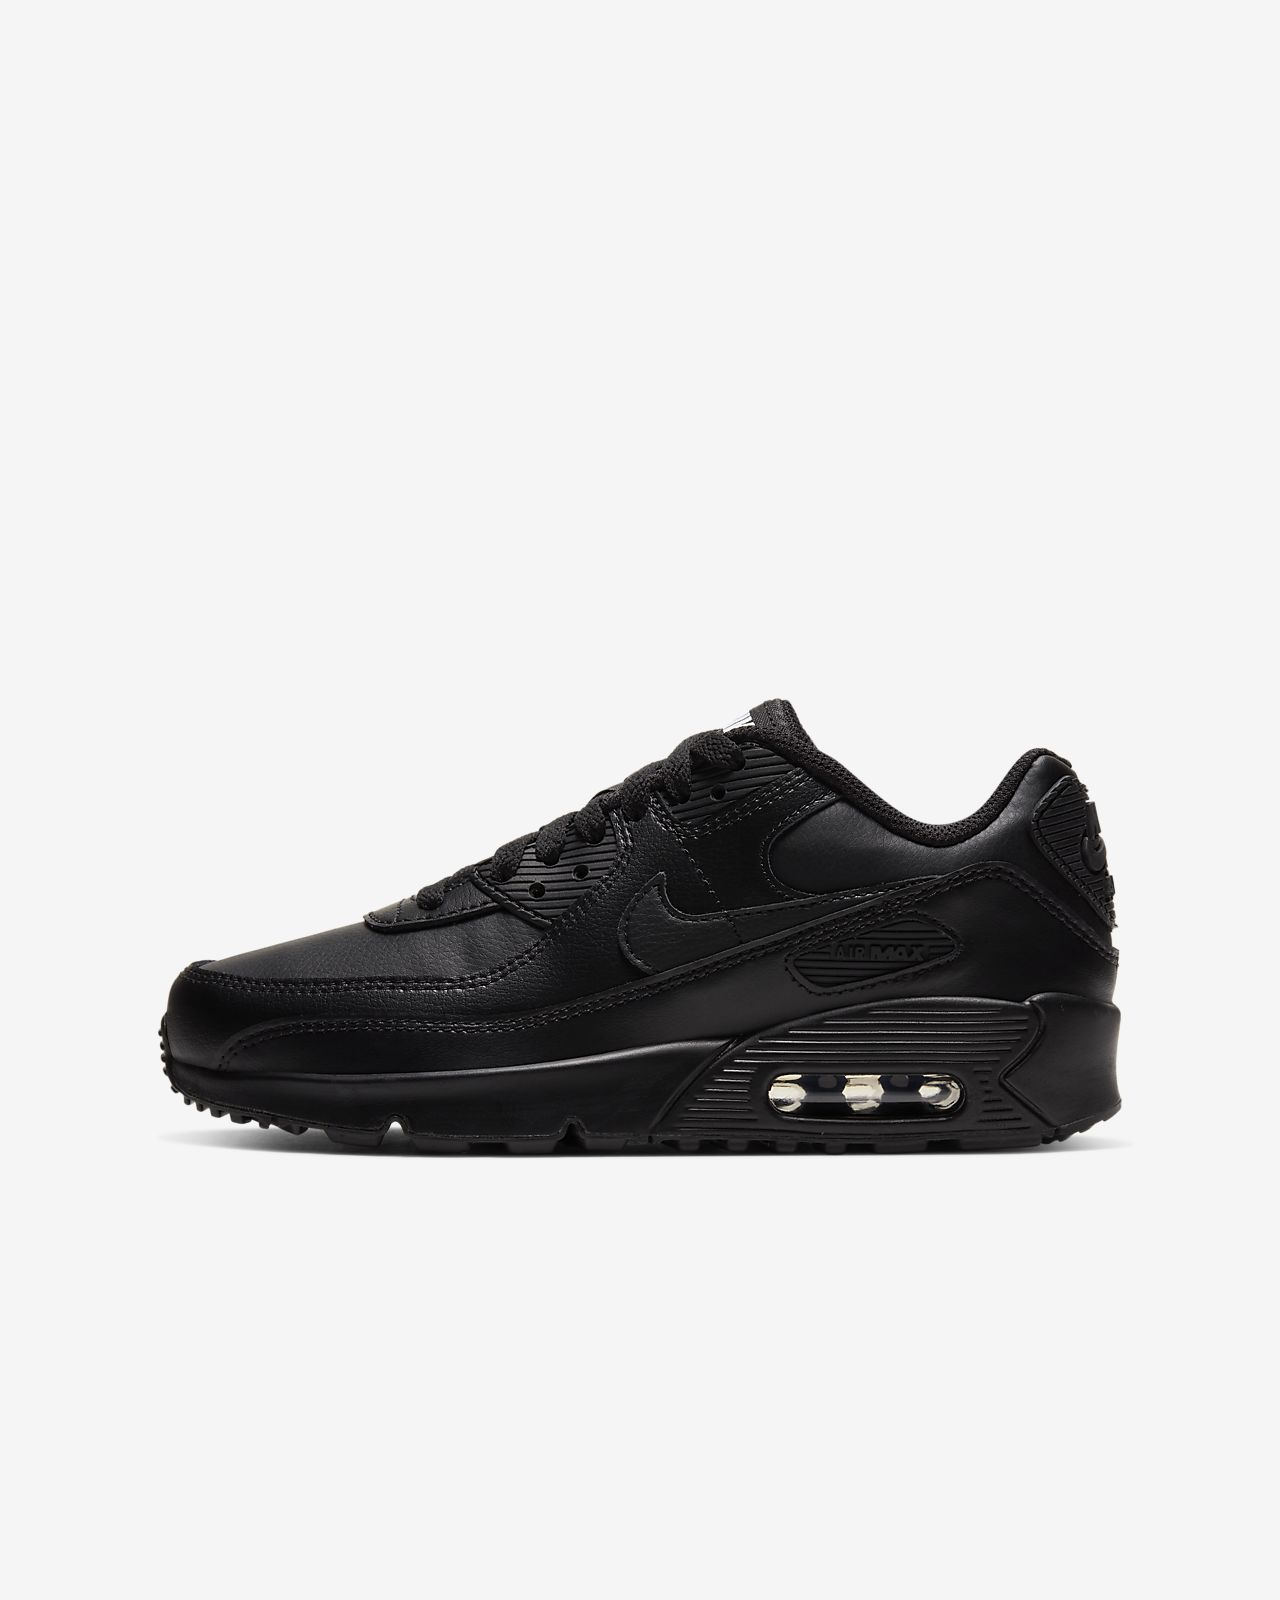 Details zu Neu Schuhe NIKE AIR MAX 90 LEATHER Herren Turnschuhe EXCLUSIVE Sneaker ORIGINAL